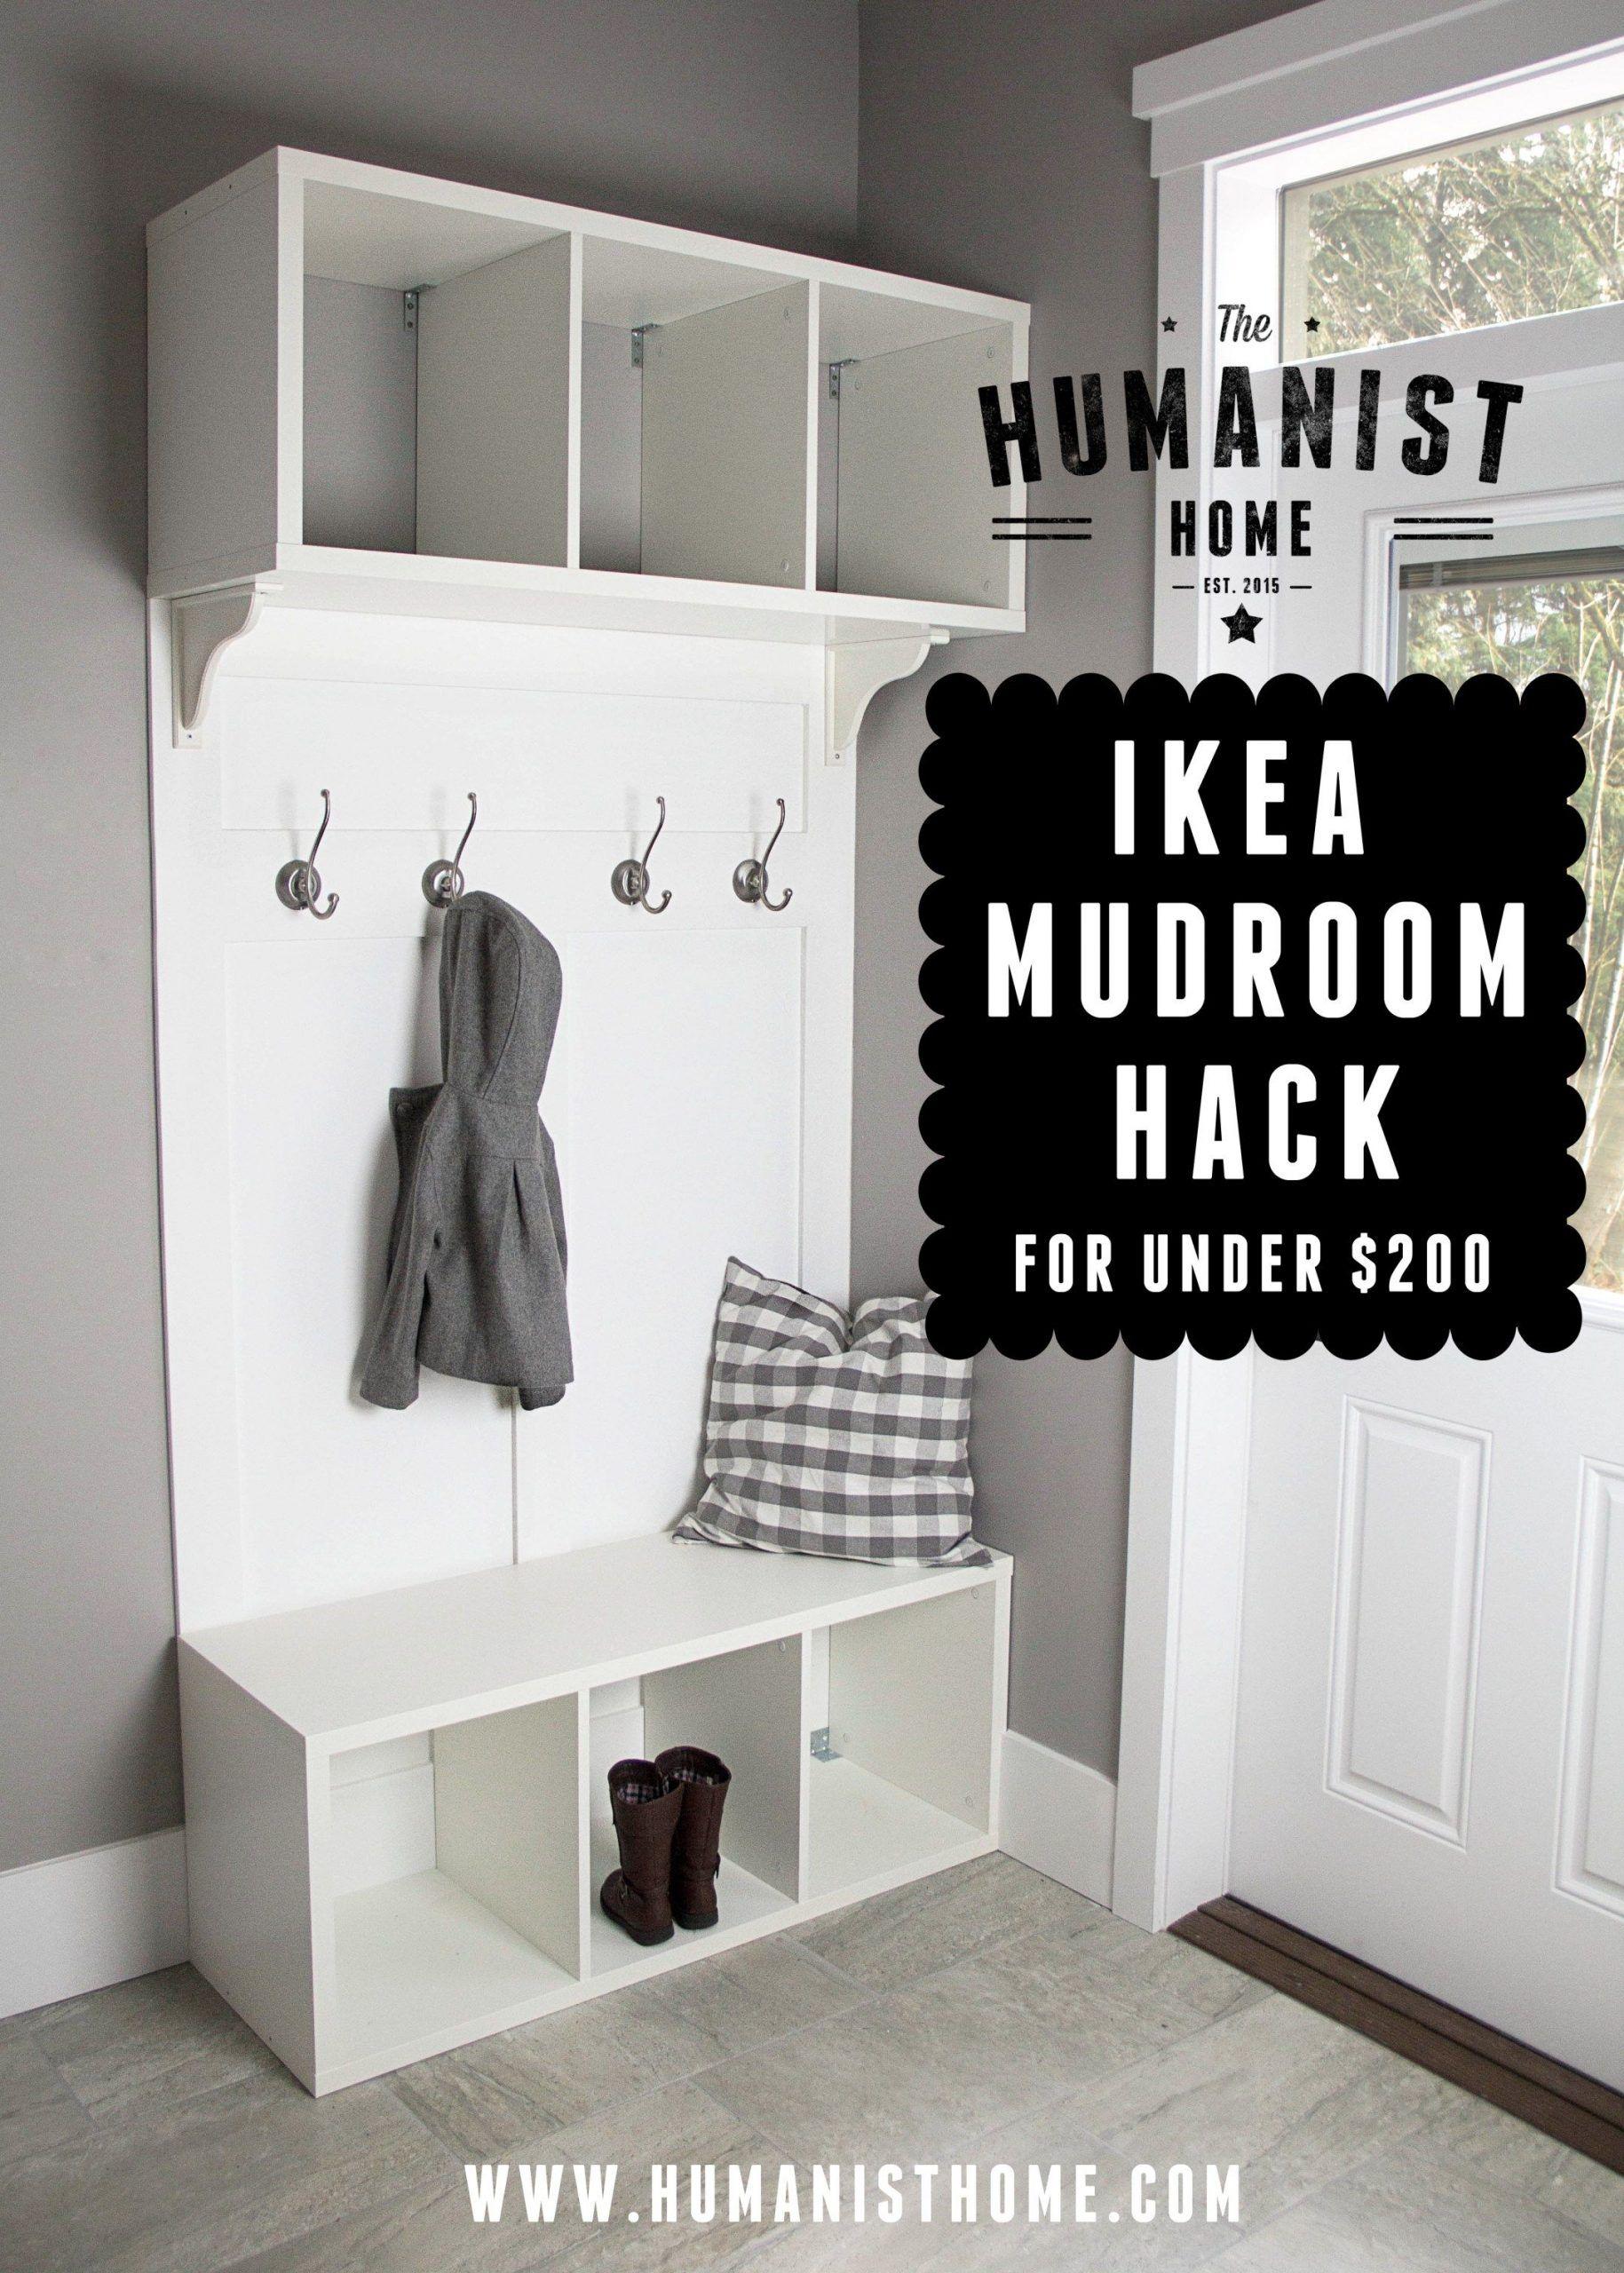 diy make your own ikea hack mudroom bench storage on inspiring diy garage storage design ideas on a budget to maximize your garage id=74349